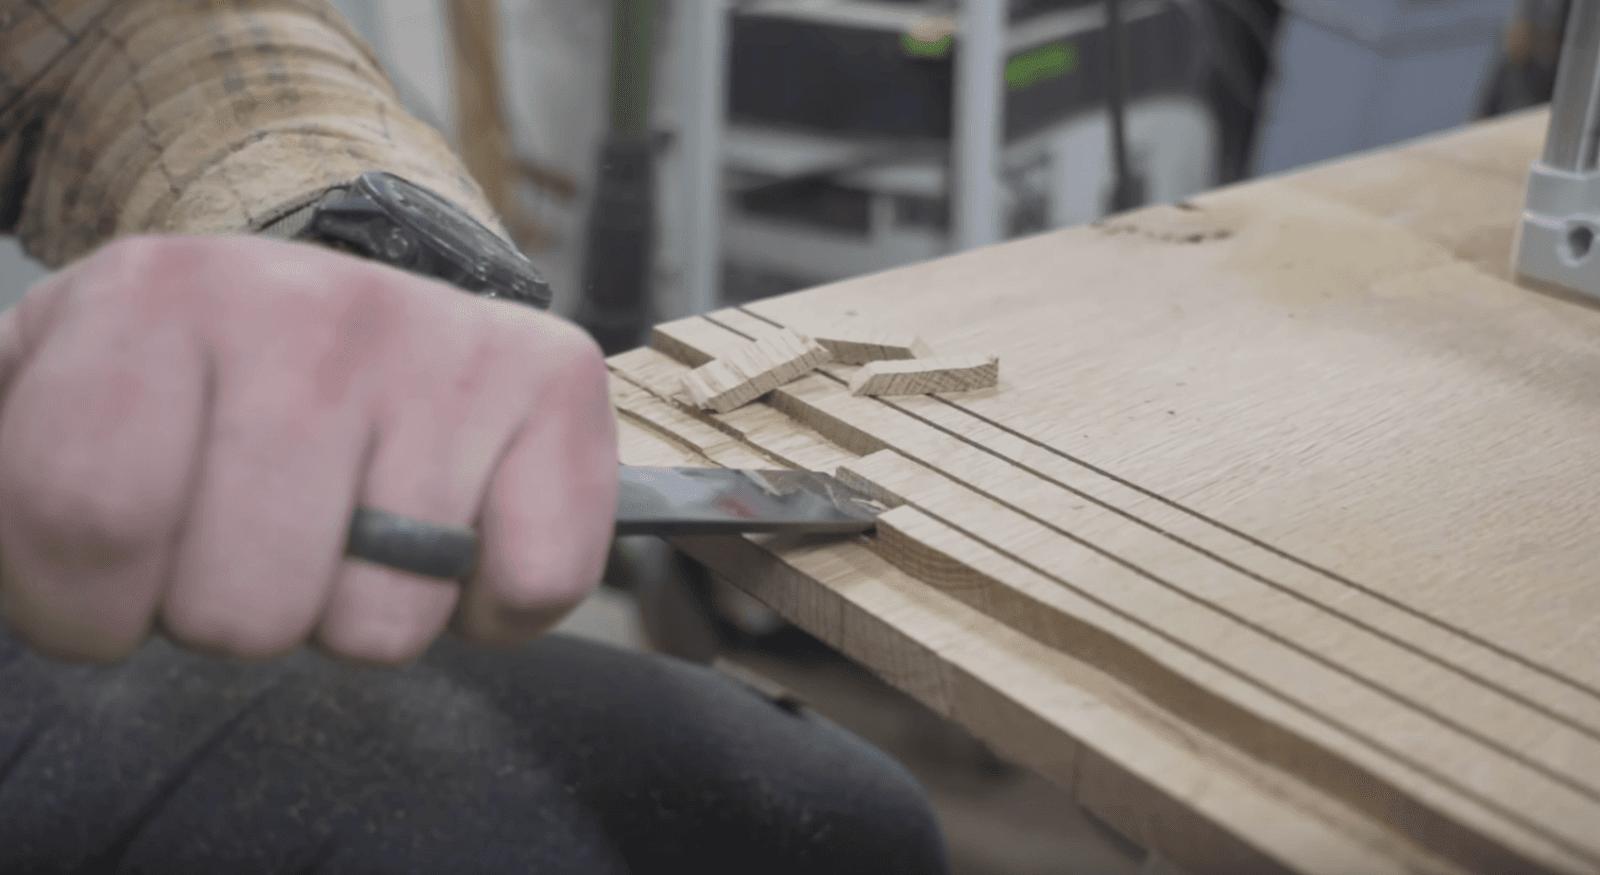 Creating breadboard ends